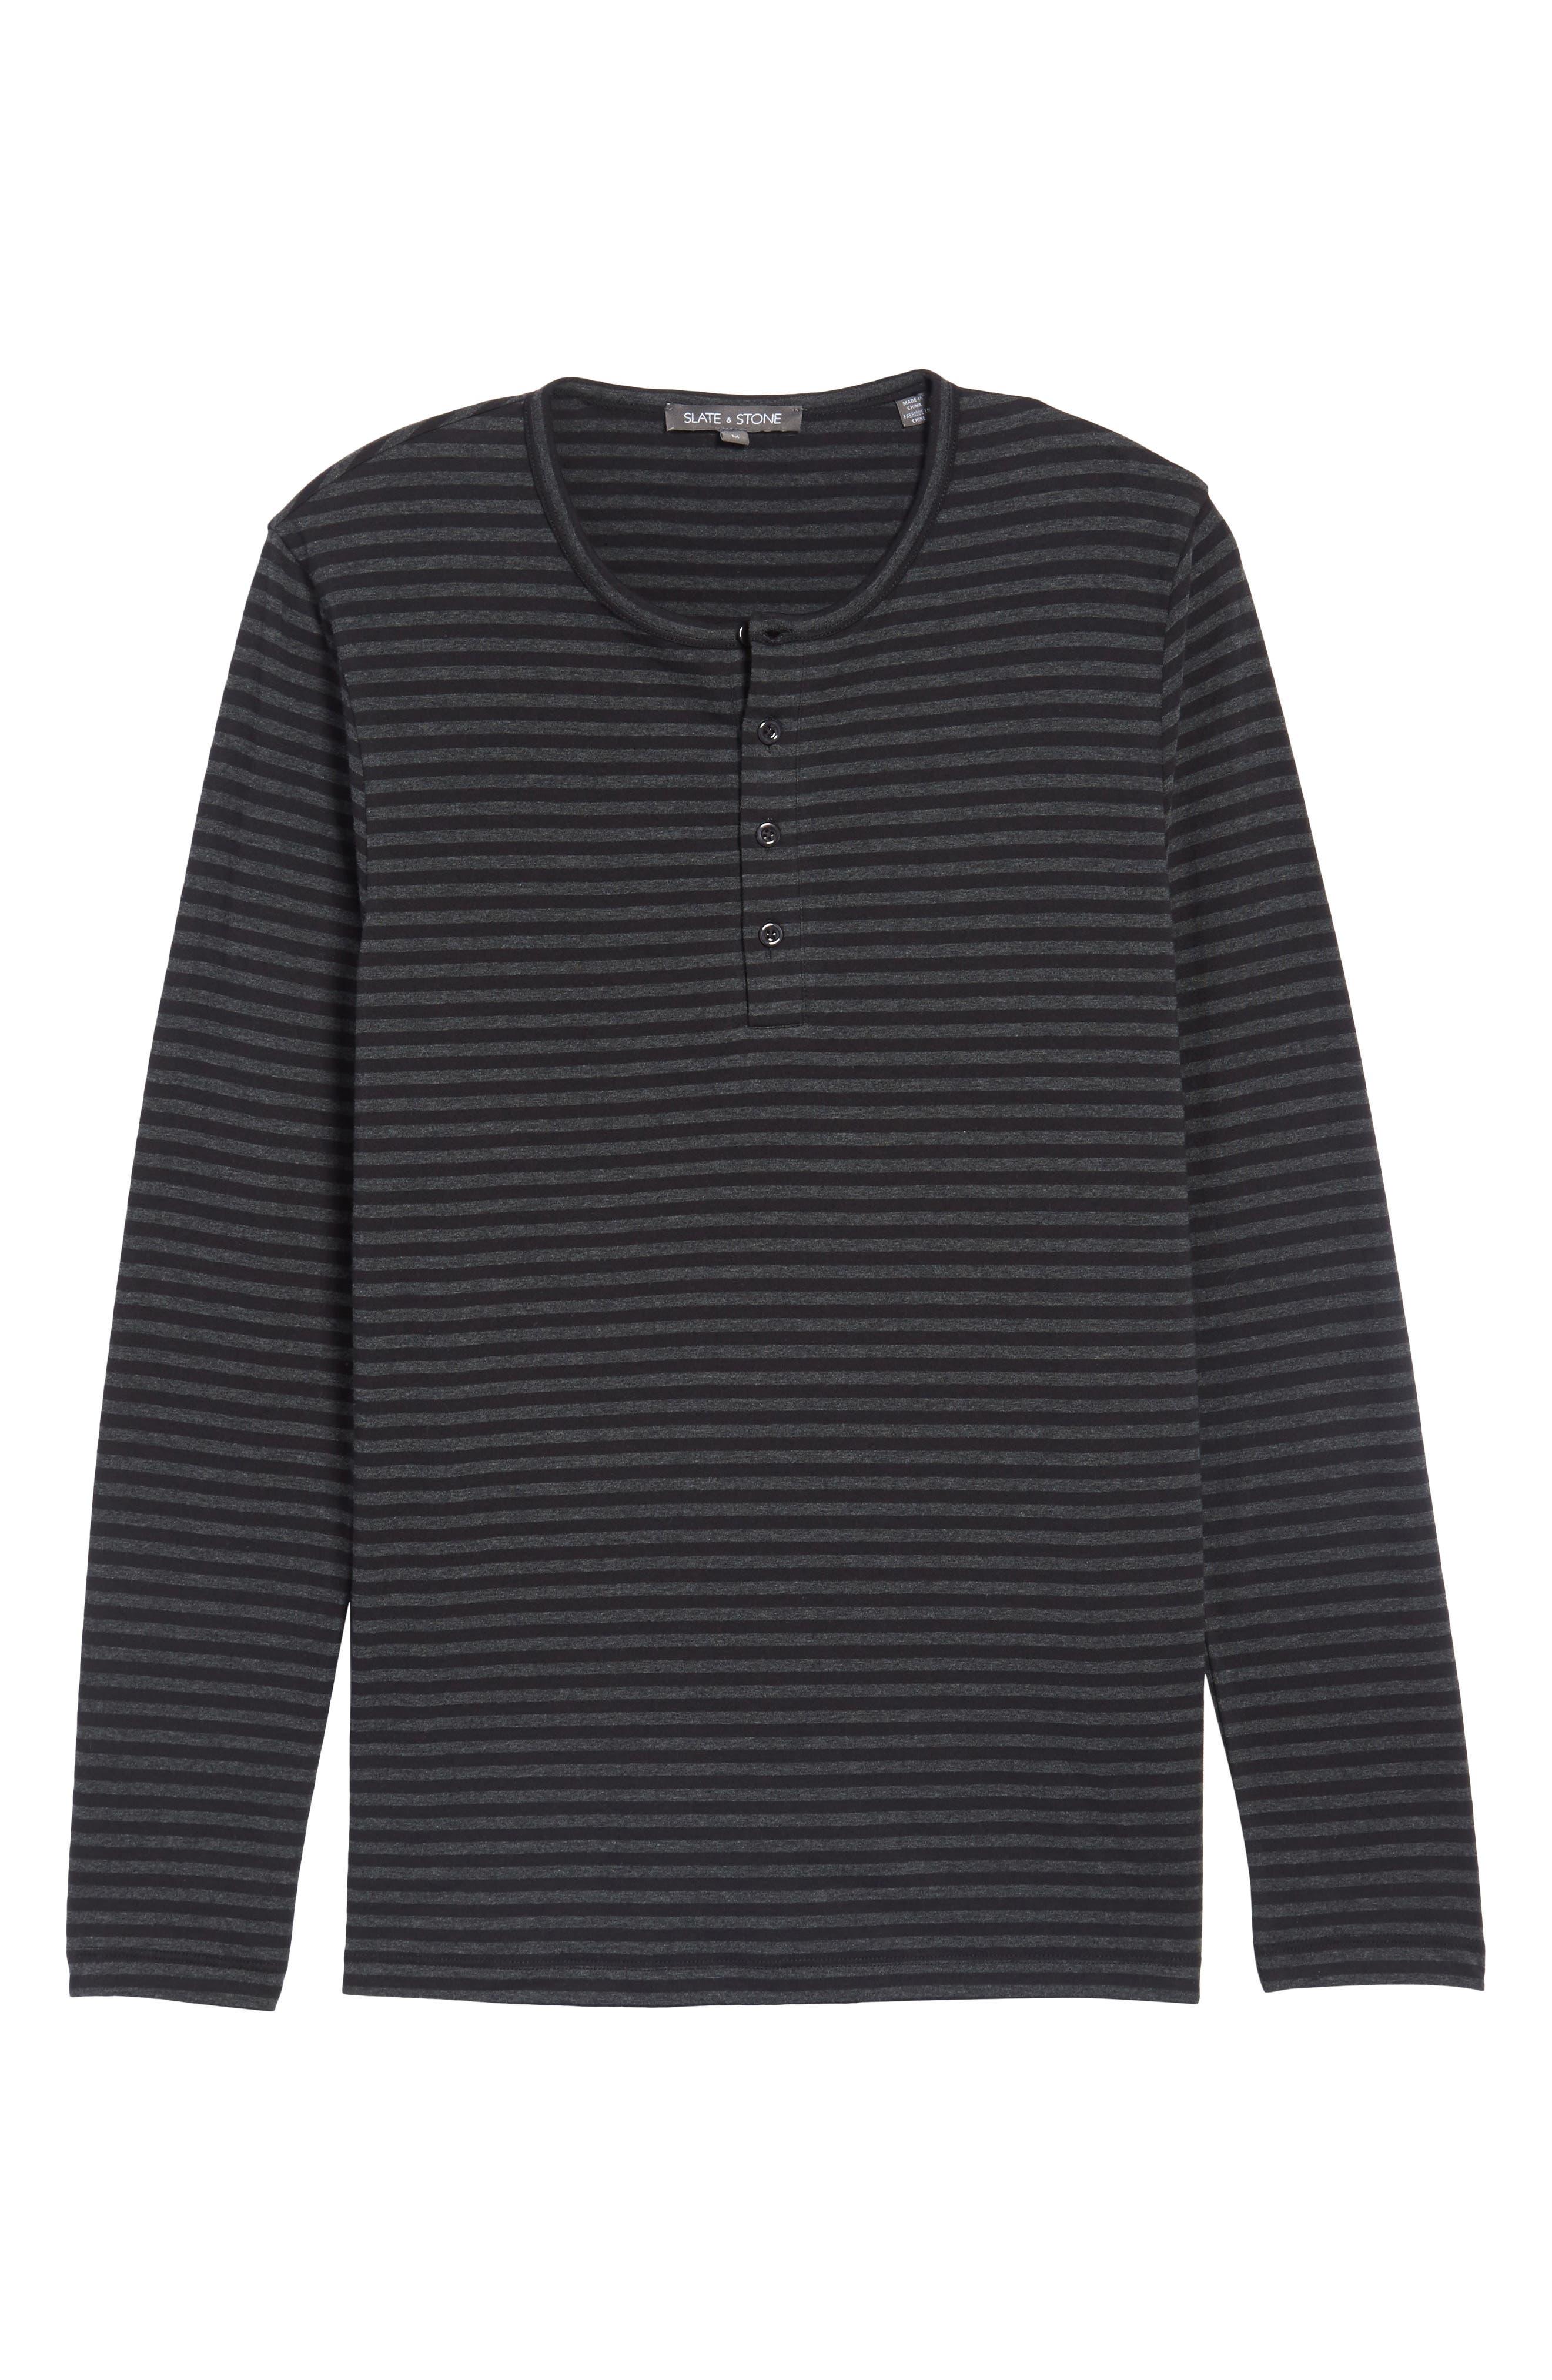 Long Sleeve Henley T-Shirt,                             Alternate thumbnail 6, color,                             Black/ Charcoal Stripe